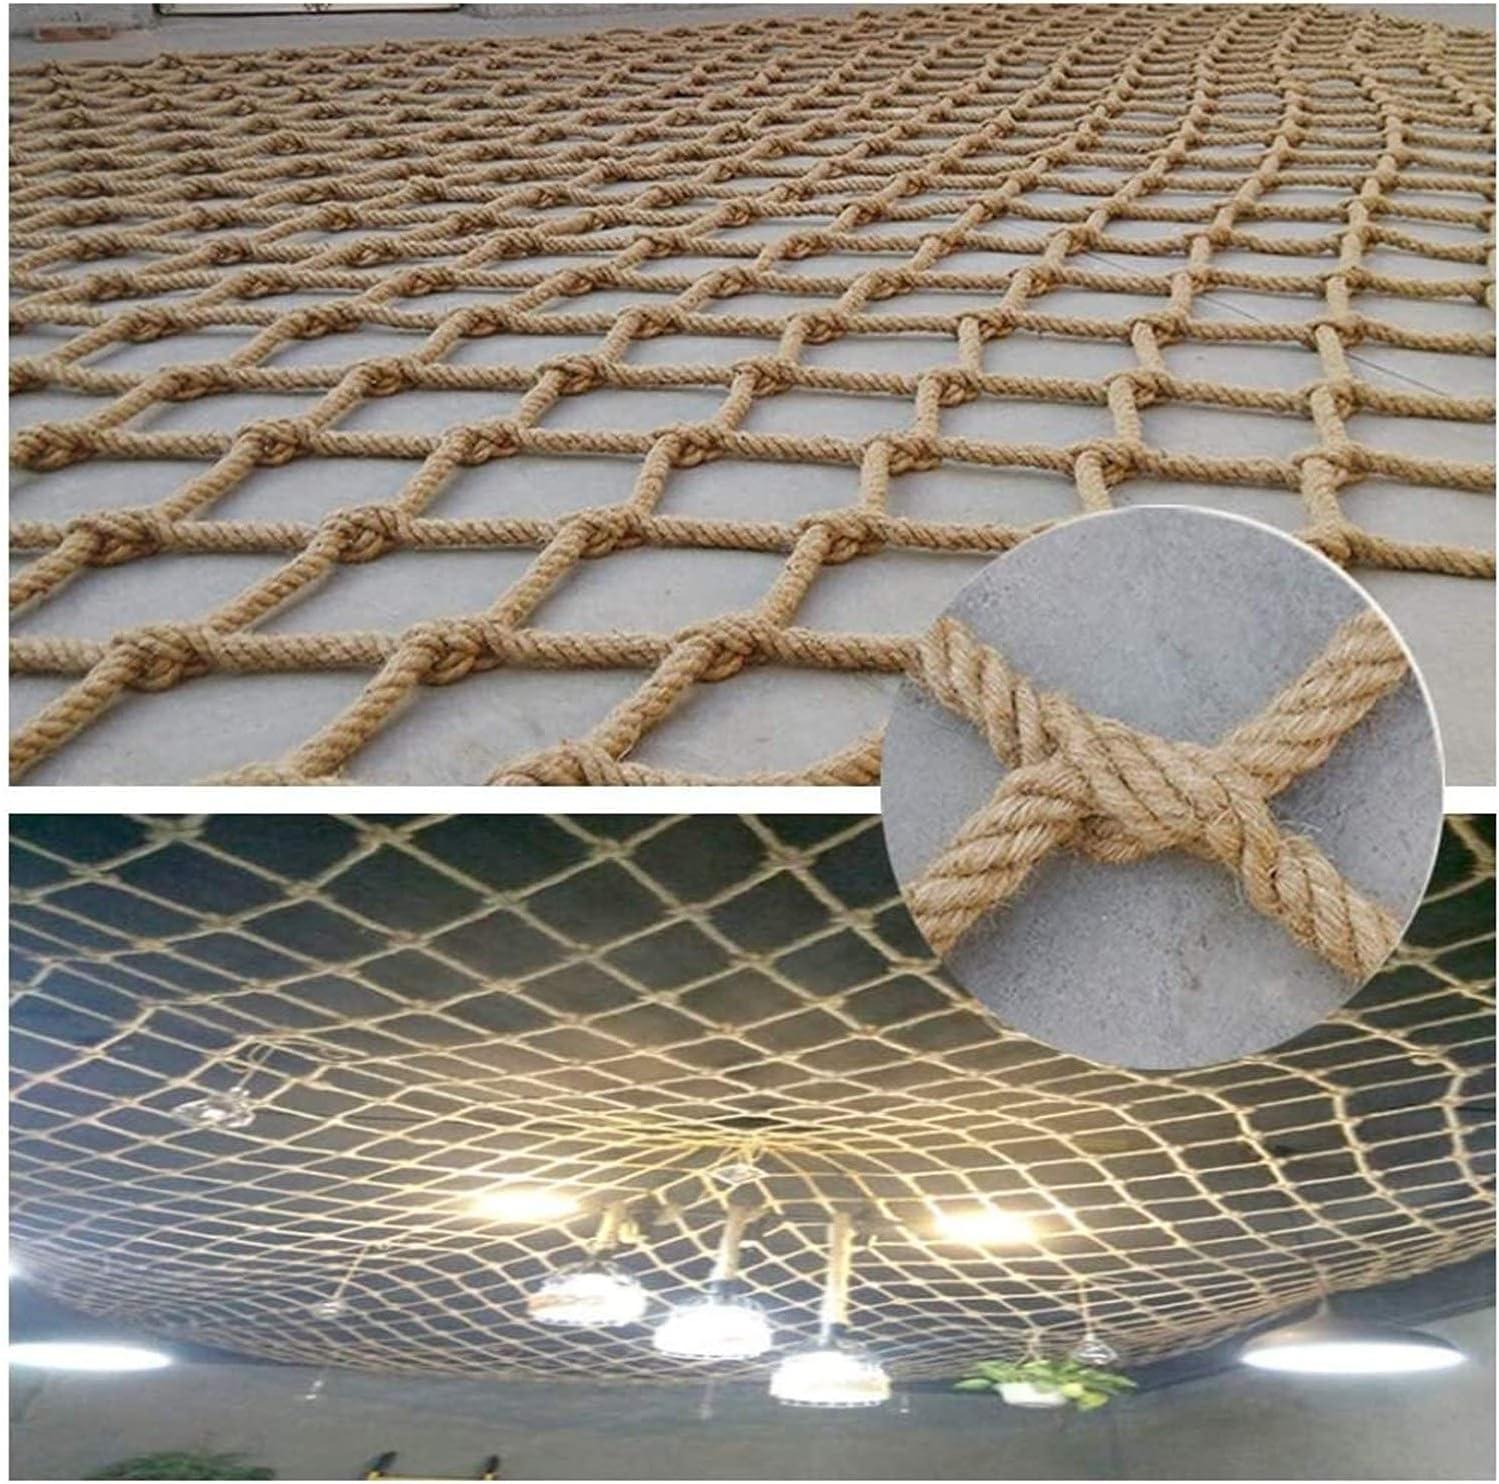 Rope Netting Limited price New Free Shipping Heavy Duty Outdoor Railing Decor Ne Hemp Cargo